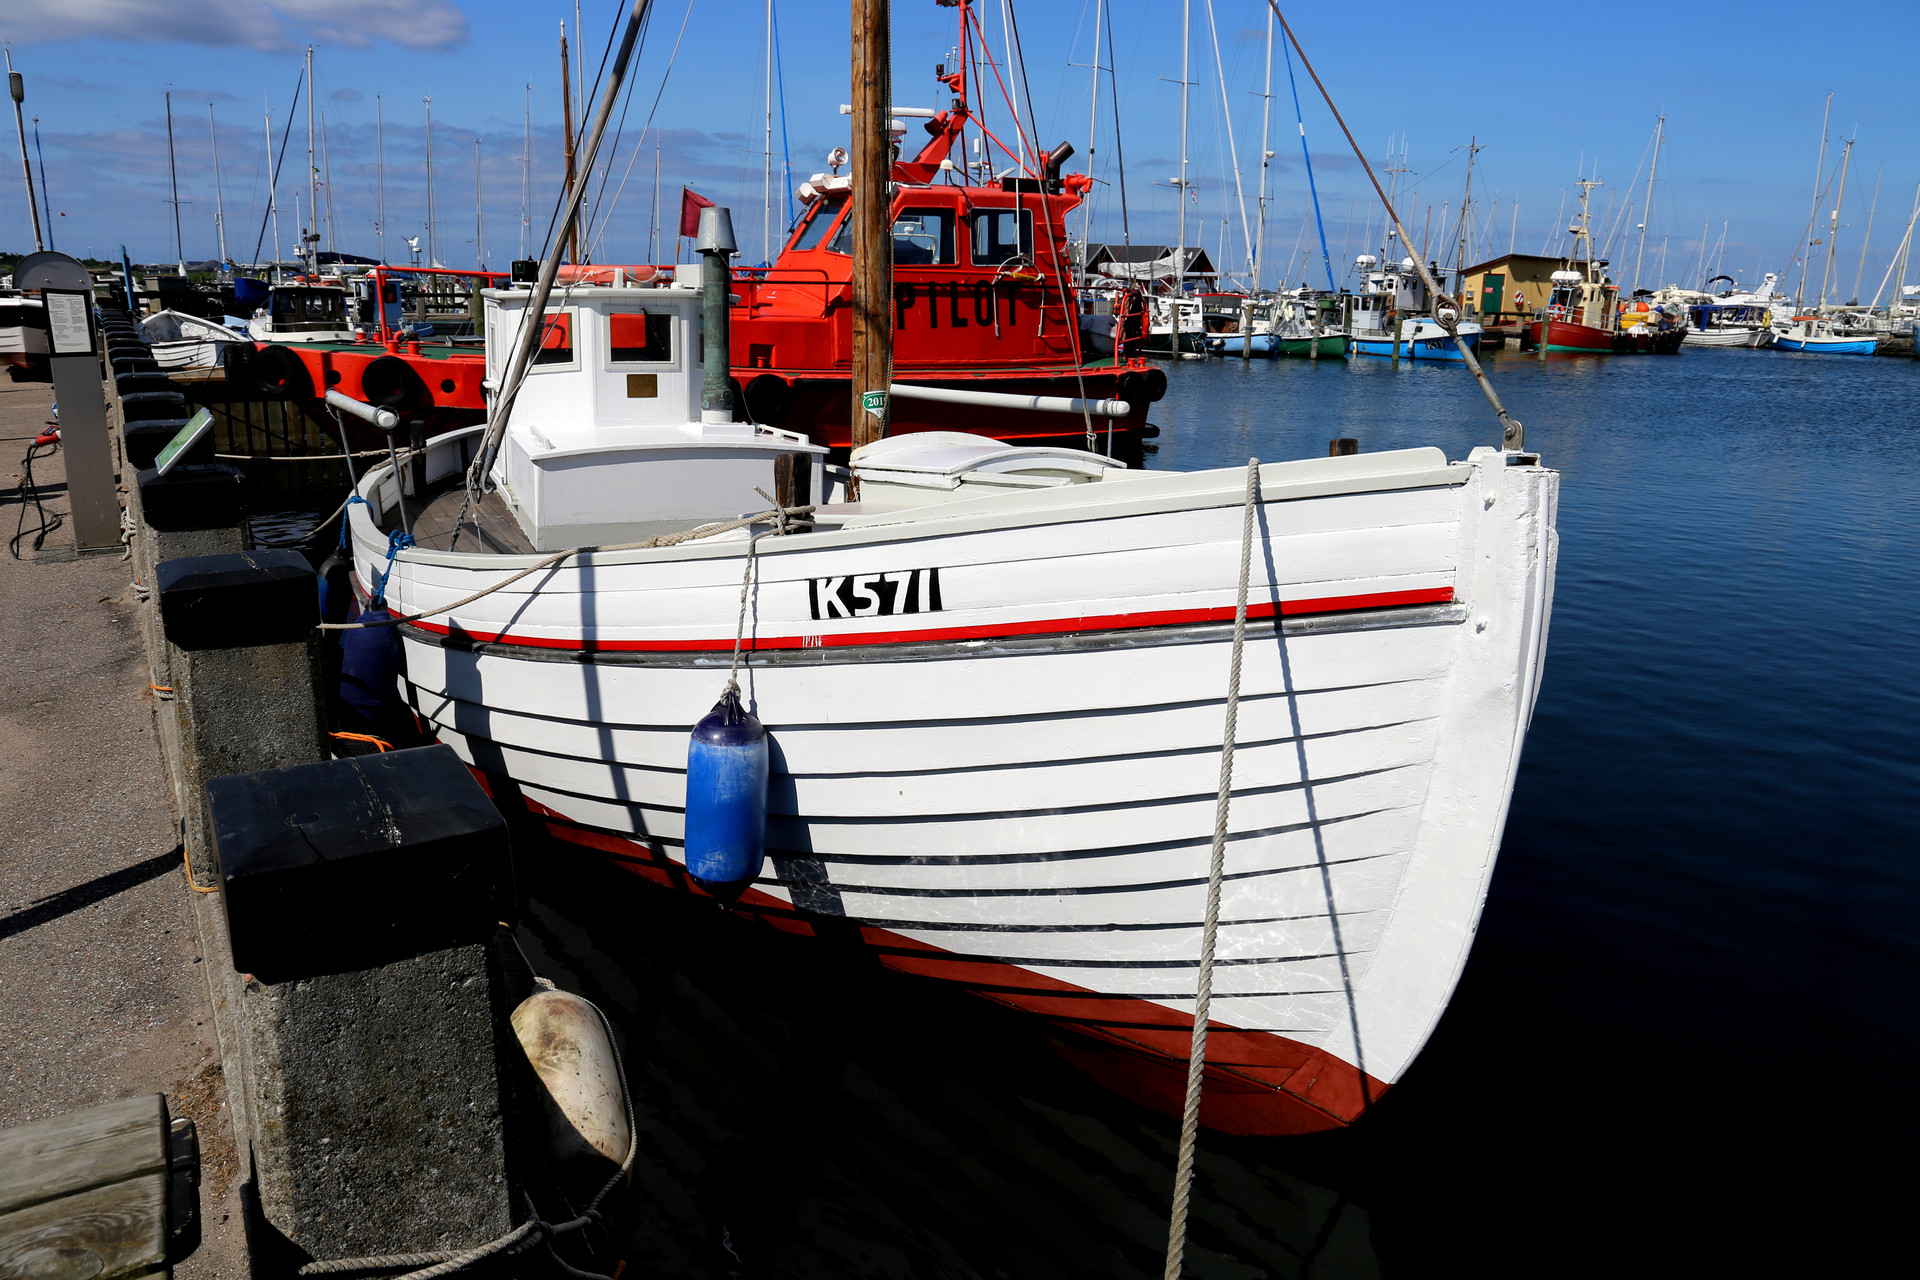 Båden K571 Elisabeth